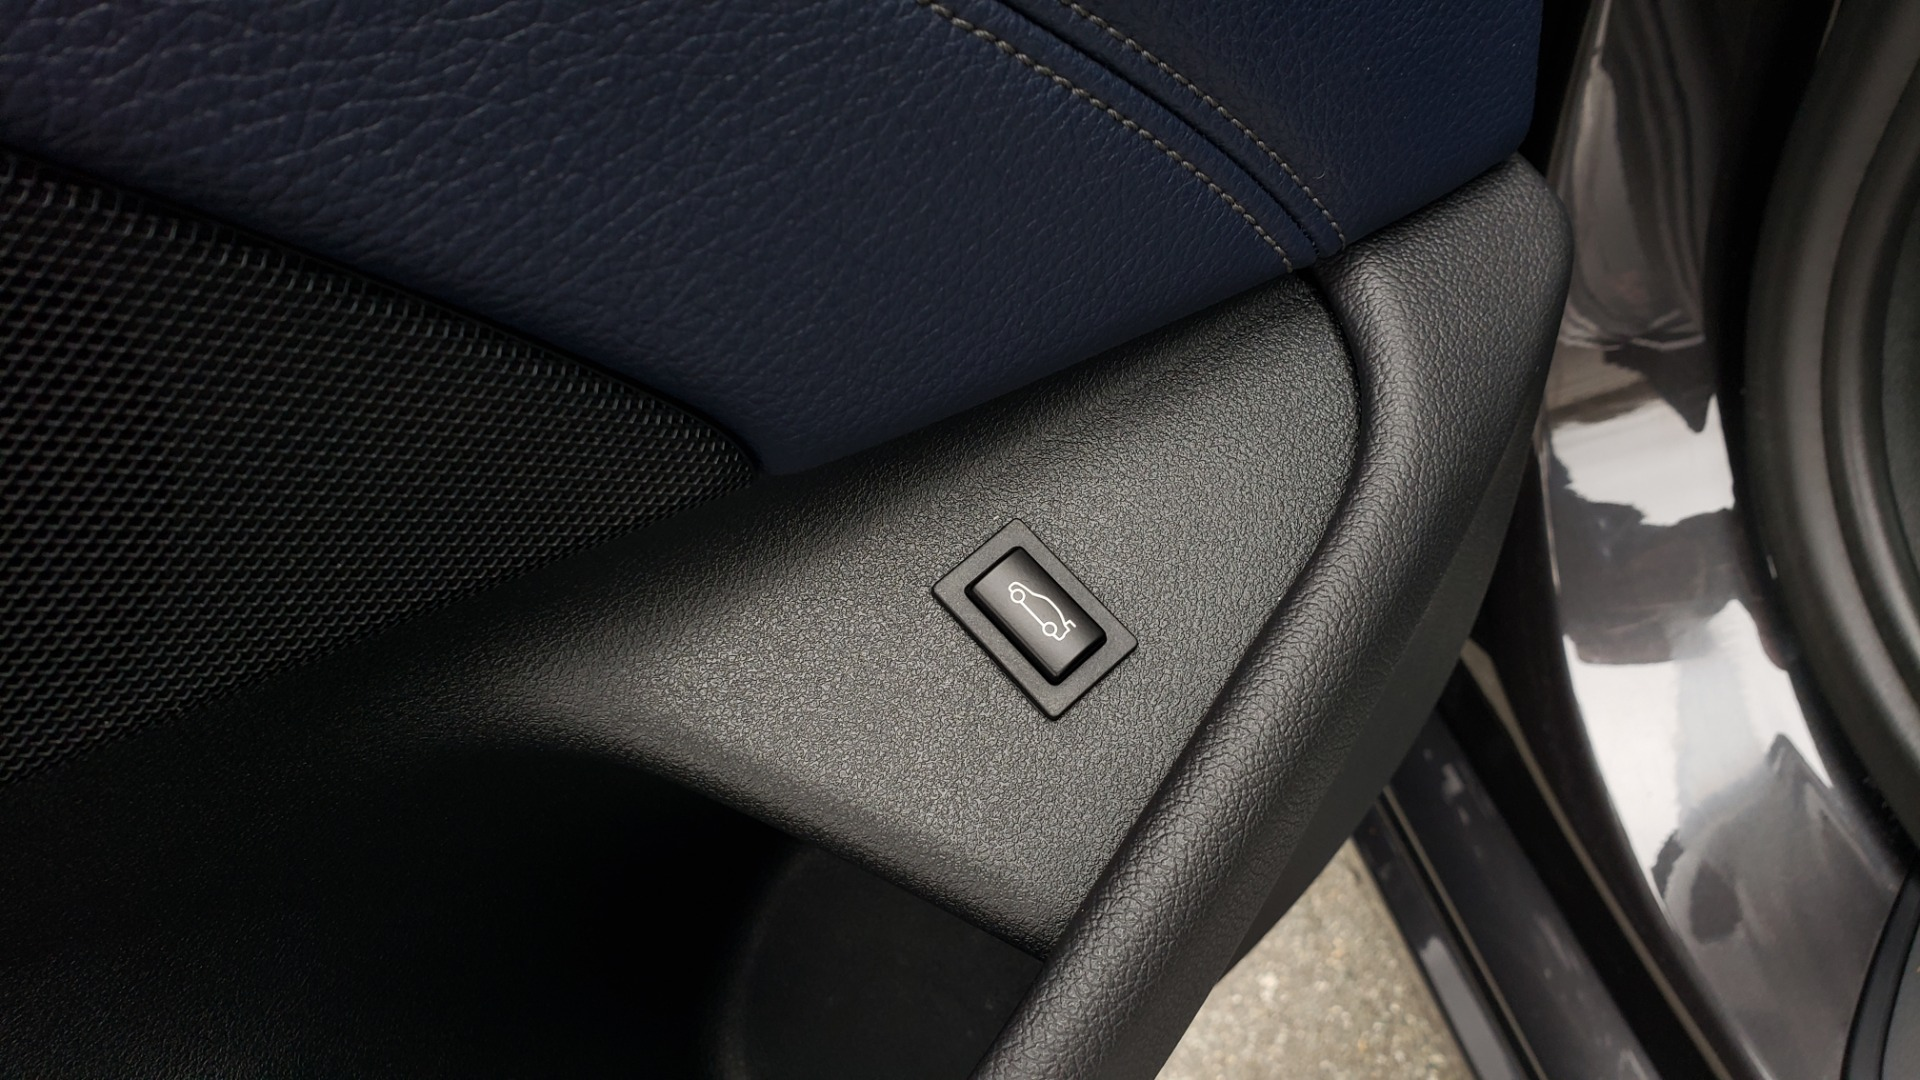 Used 2017 BMW 5 SERIES 530IXDRIVE / PREM PKG / DRVR ASST PLUS / CLD WTHR / APPLE CARPLAY for sale Sold at Formula Imports in Charlotte NC 28227 31